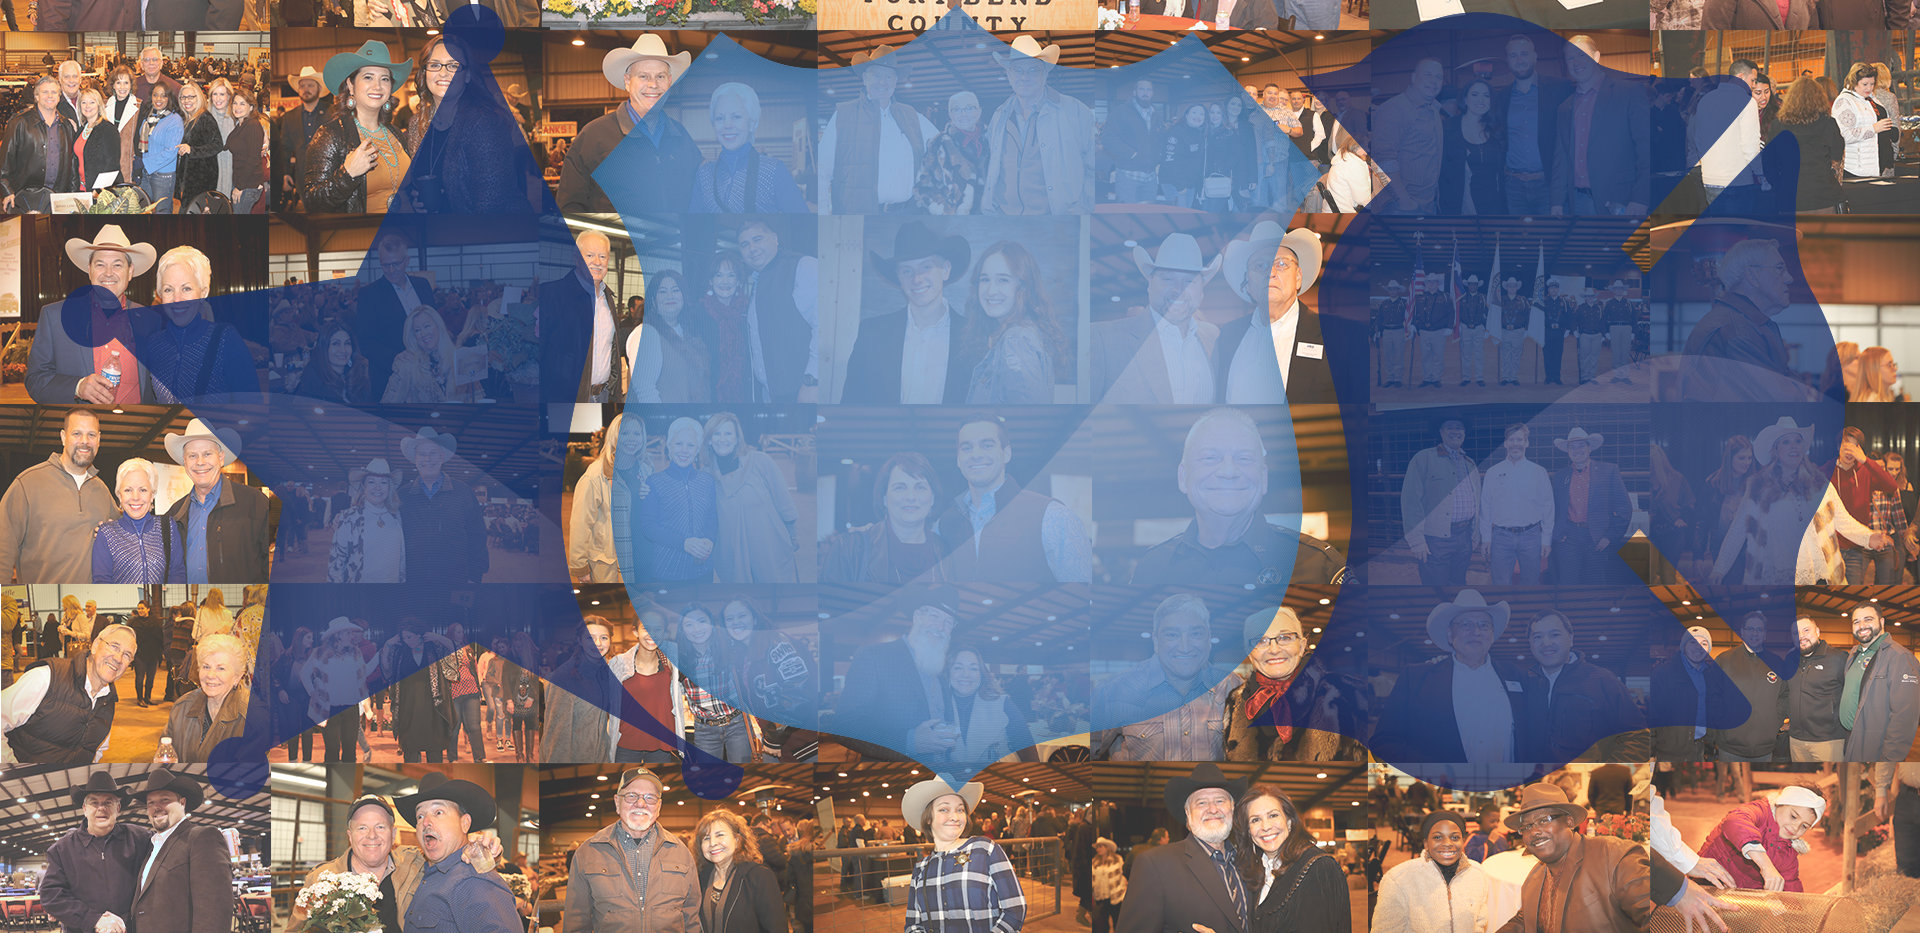 BTB Gala 2019 collage btb flag Backgroun